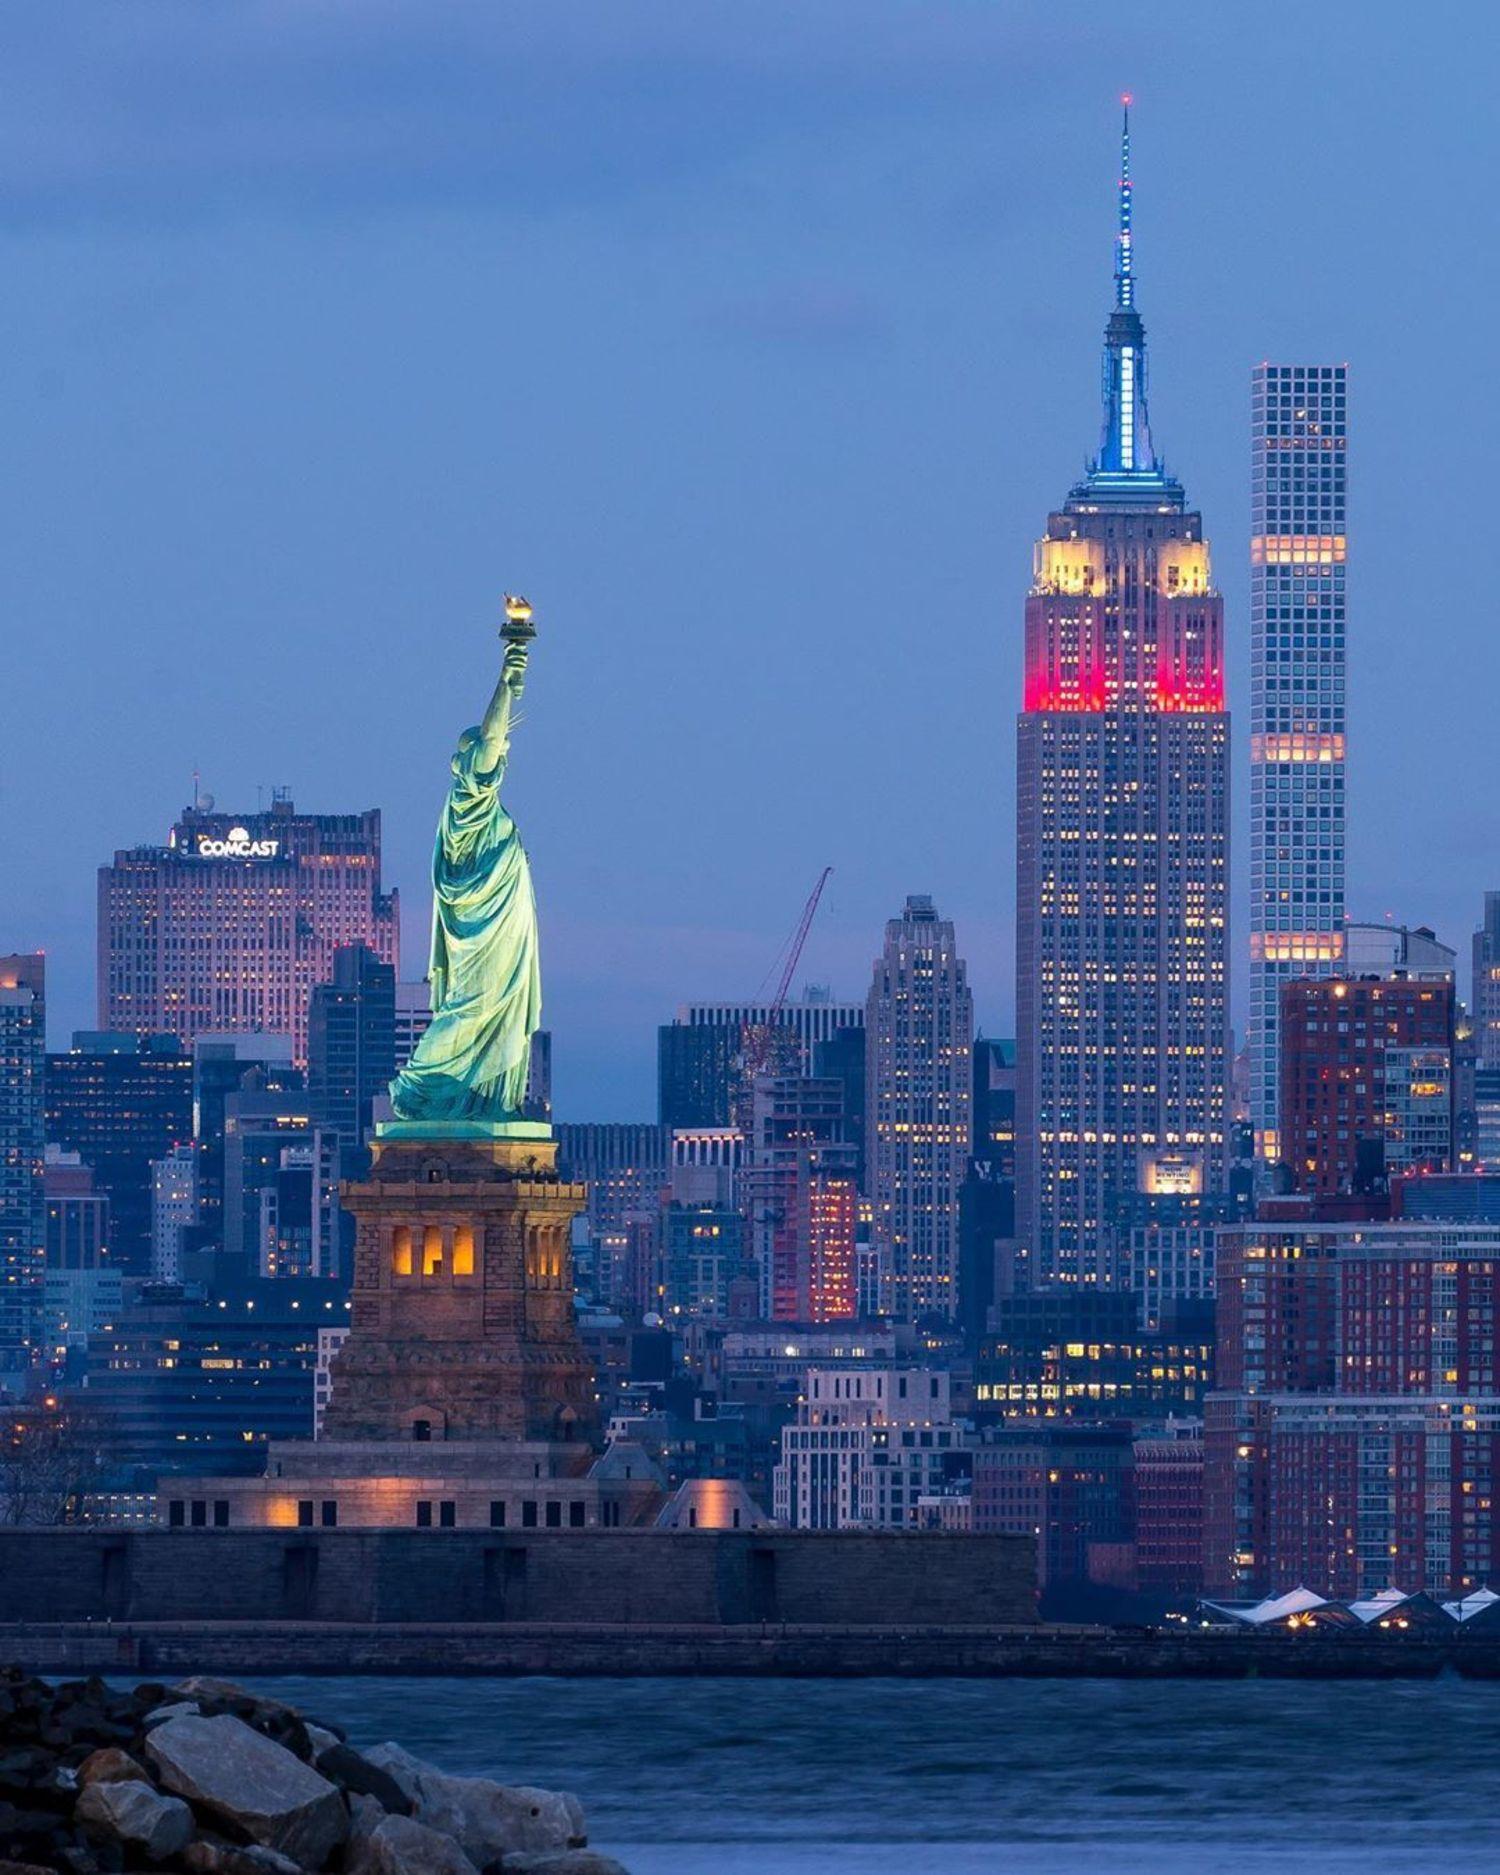 New York Harbor, Liberty Island, and Lower Manhattan